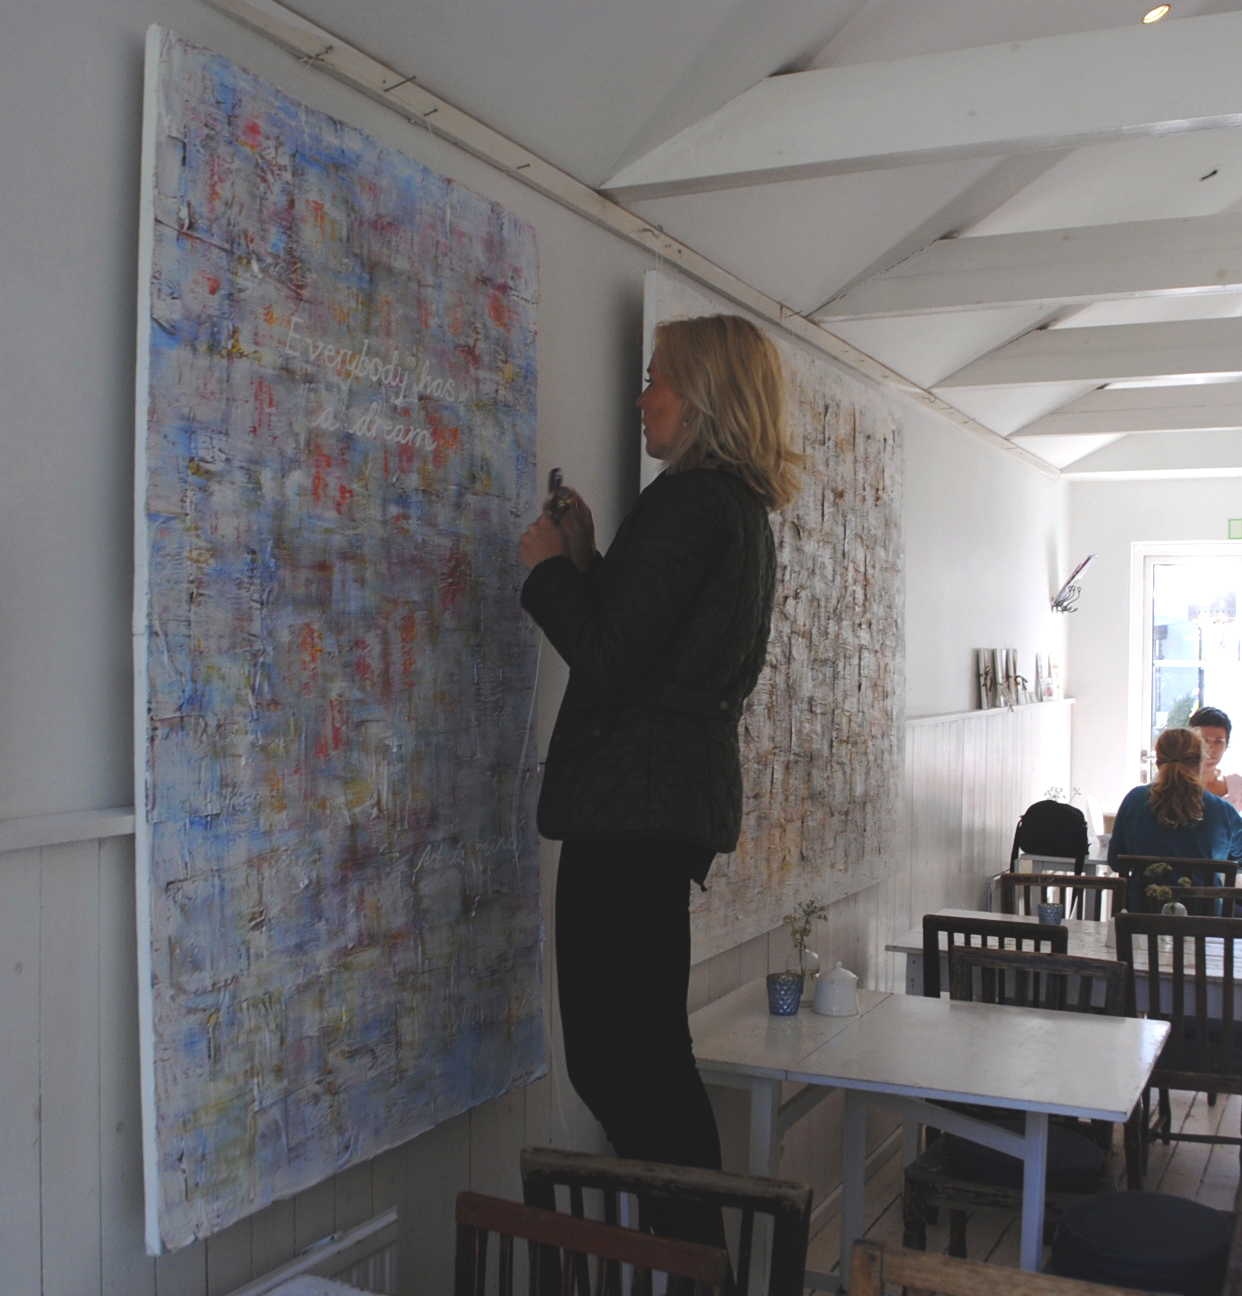 MÄRTHAS CAFÉ, HÖLLVIKEN, SWEDEN 2012